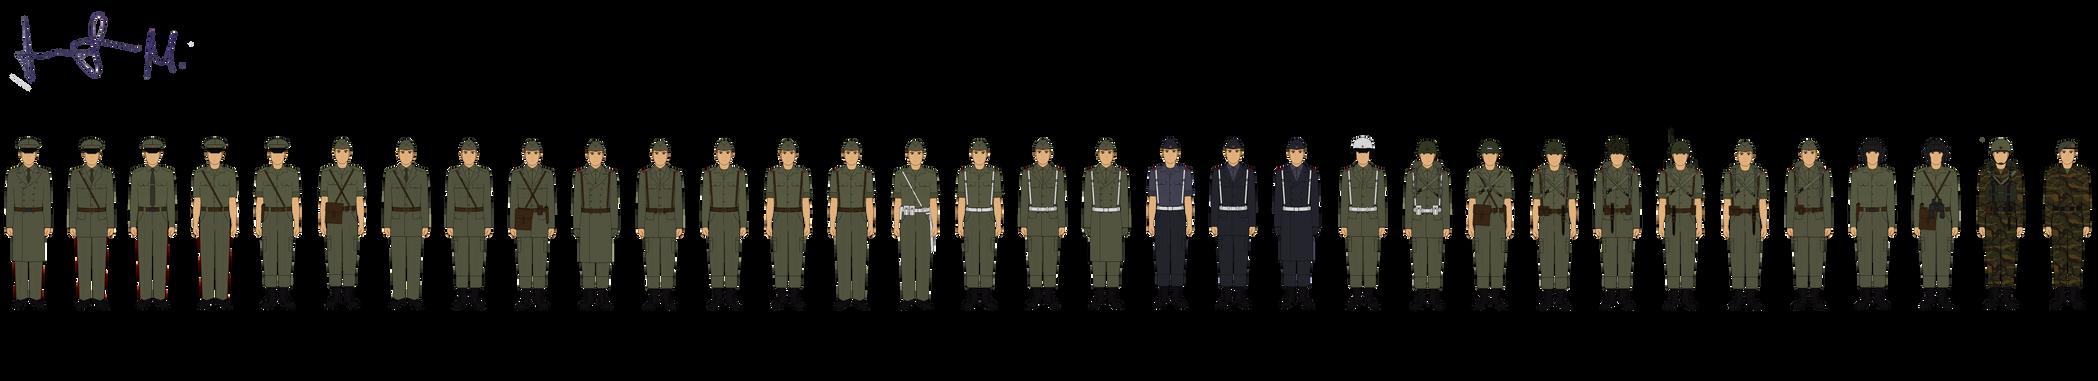 Yugoslavian National Army by Milosh--Andrich